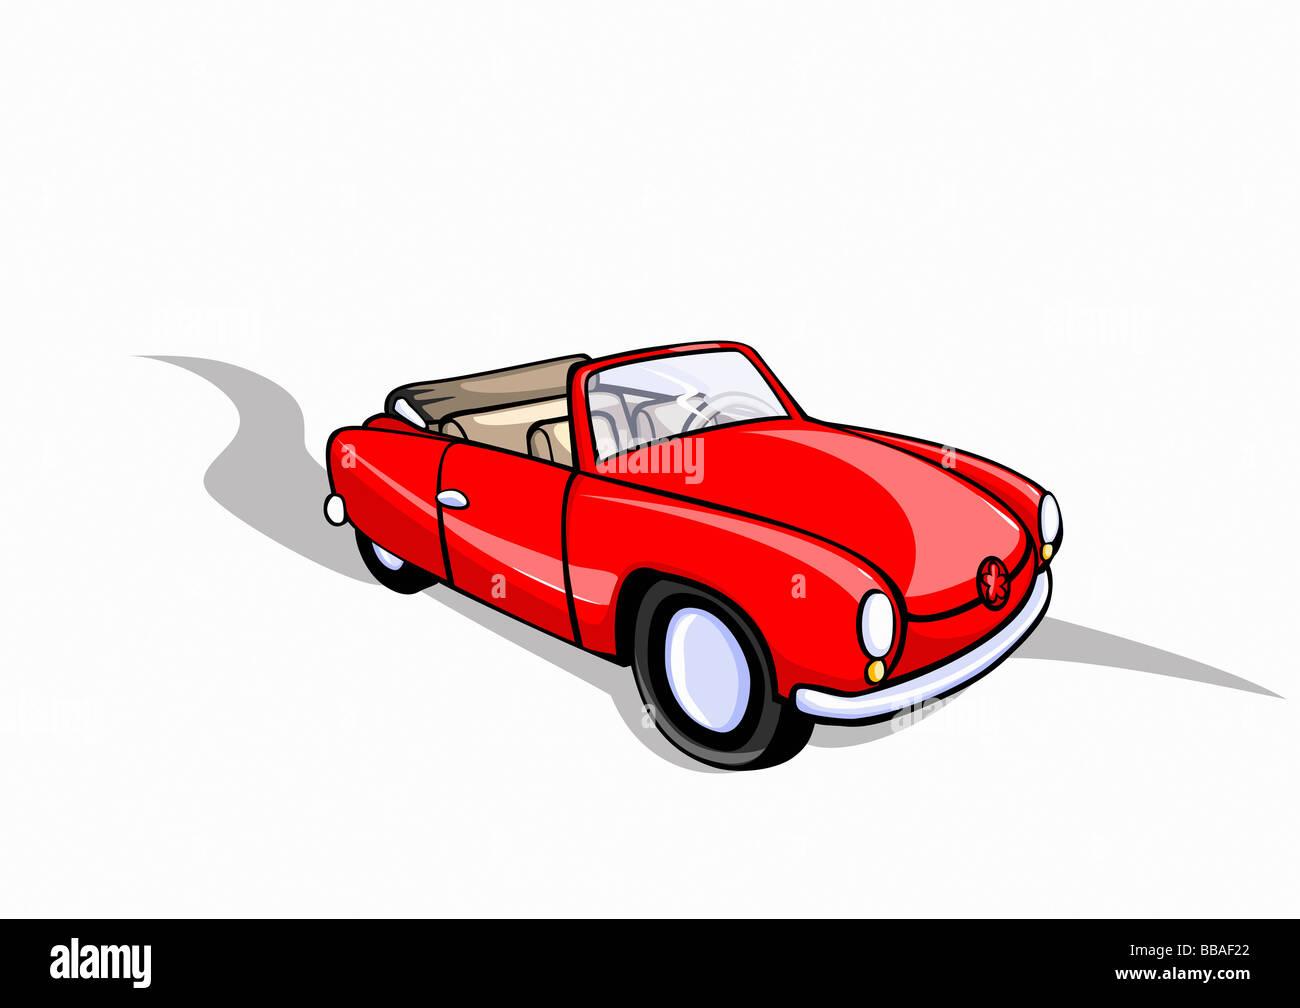 A convertible car - Stock Image